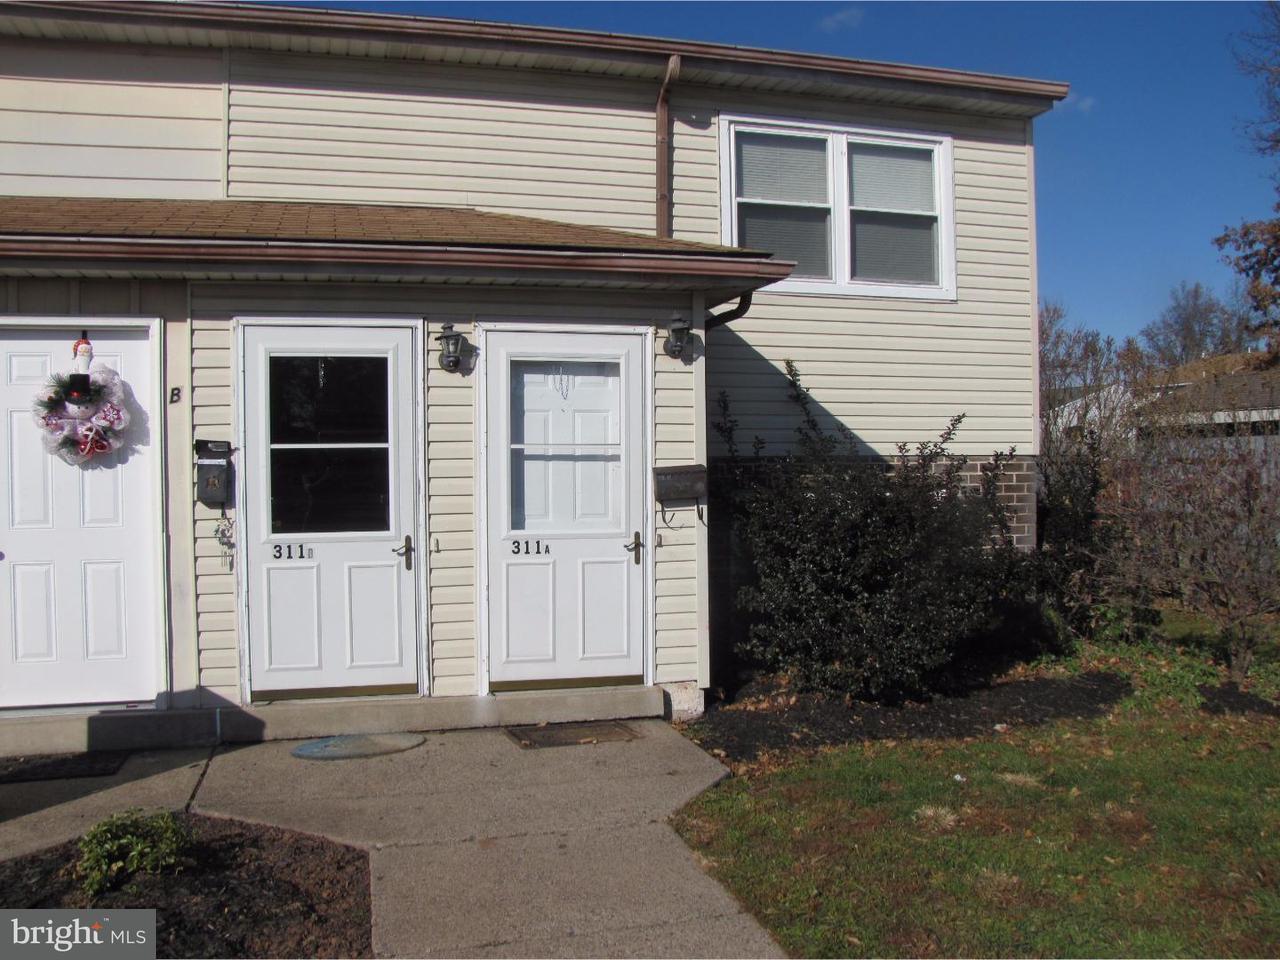 Casa Unifamiliar por un Alquiler en 311 FORGE RD ##B East Greenville, Pennsylvania 18041 Estados Unidos